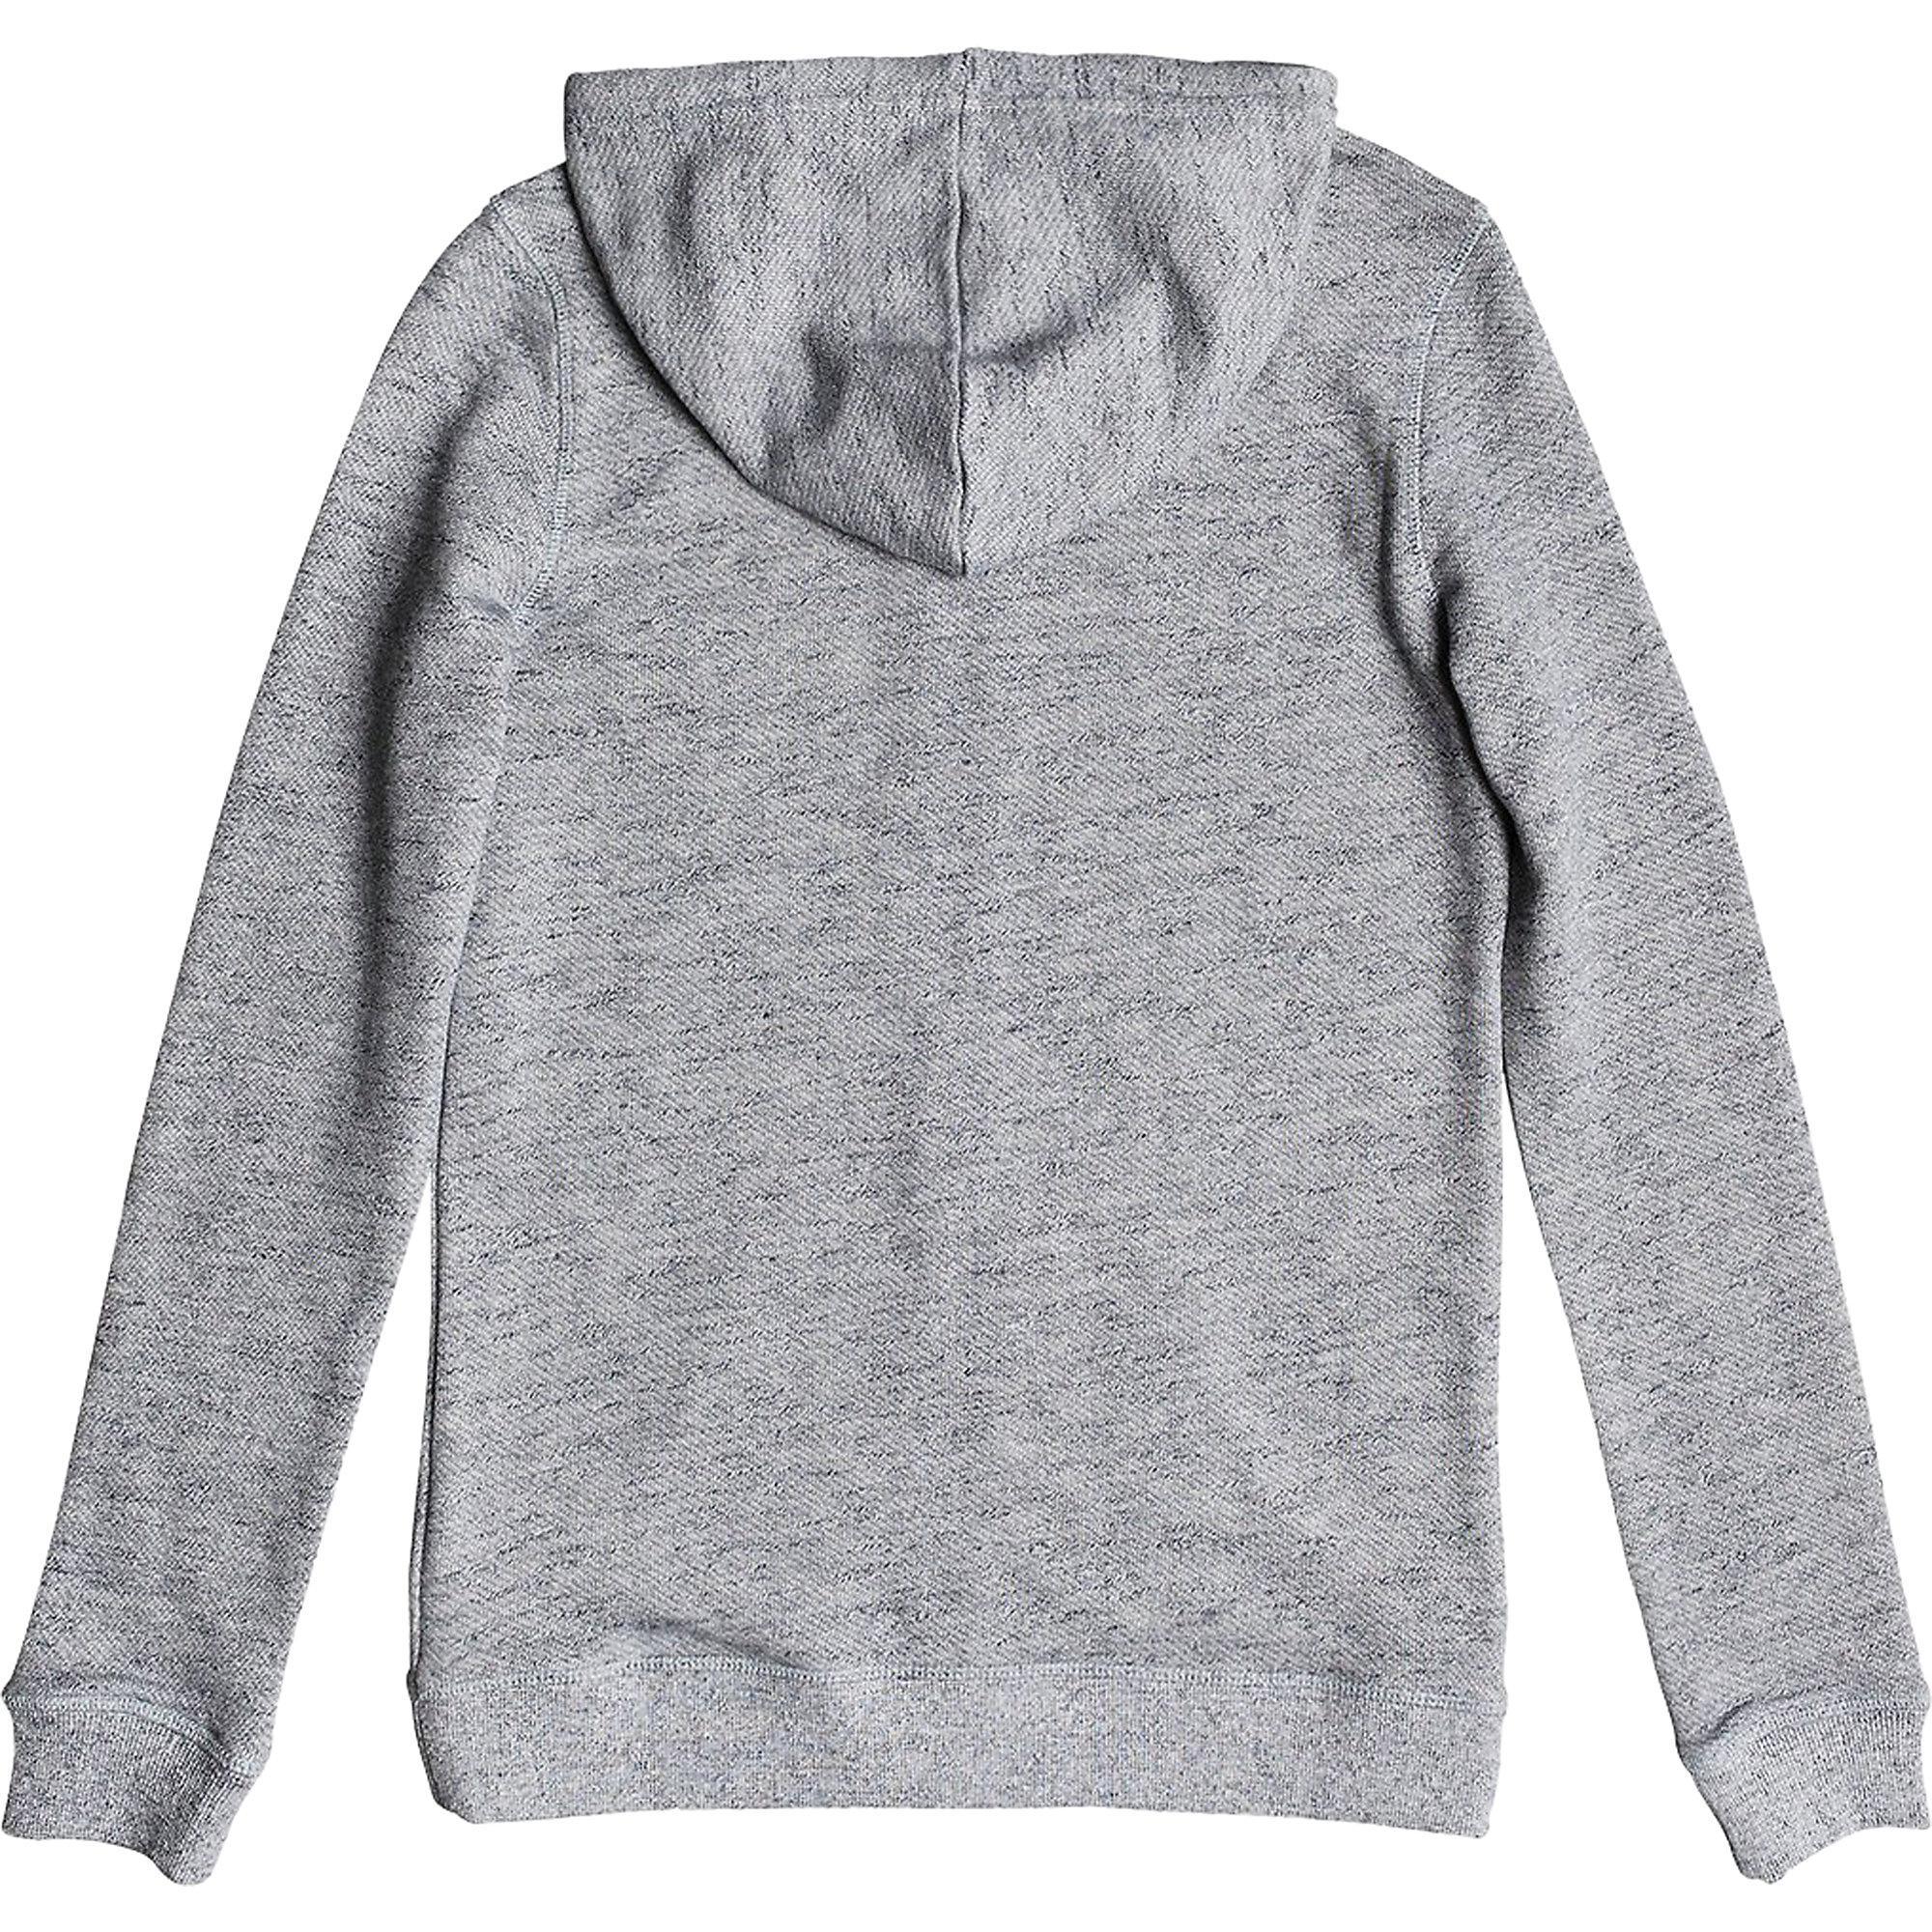 Derek Heart Juniors Lightweight V-Neck Hooded Shirt Top with Pockets Medium 7-9